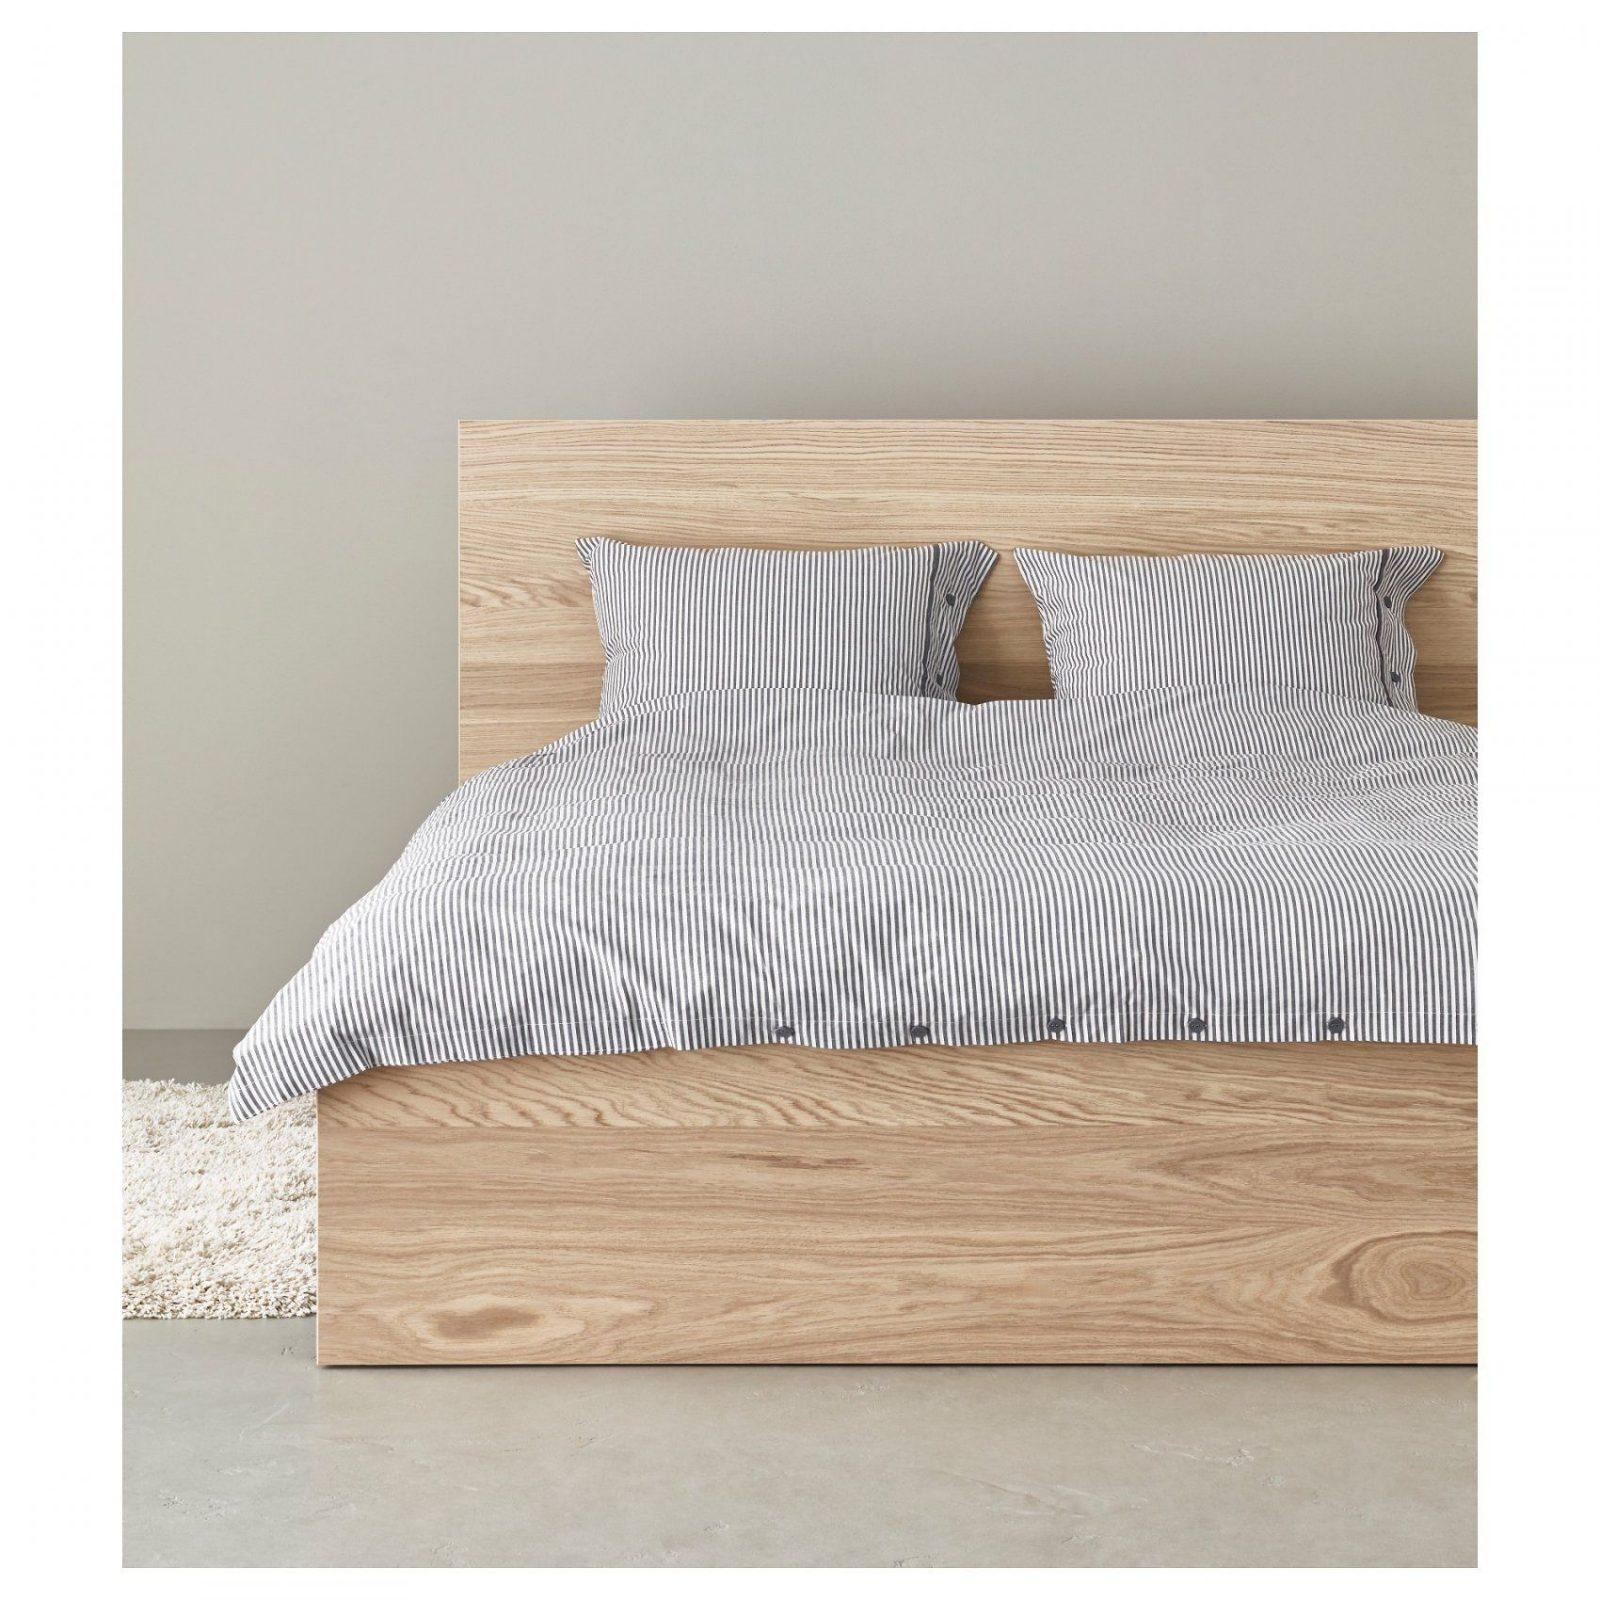 Extraordinary Inspiration Malm Bettgestell Hoch – Melian Ie Morgan von Ikea Malm Bett 160X200 Birke Bild